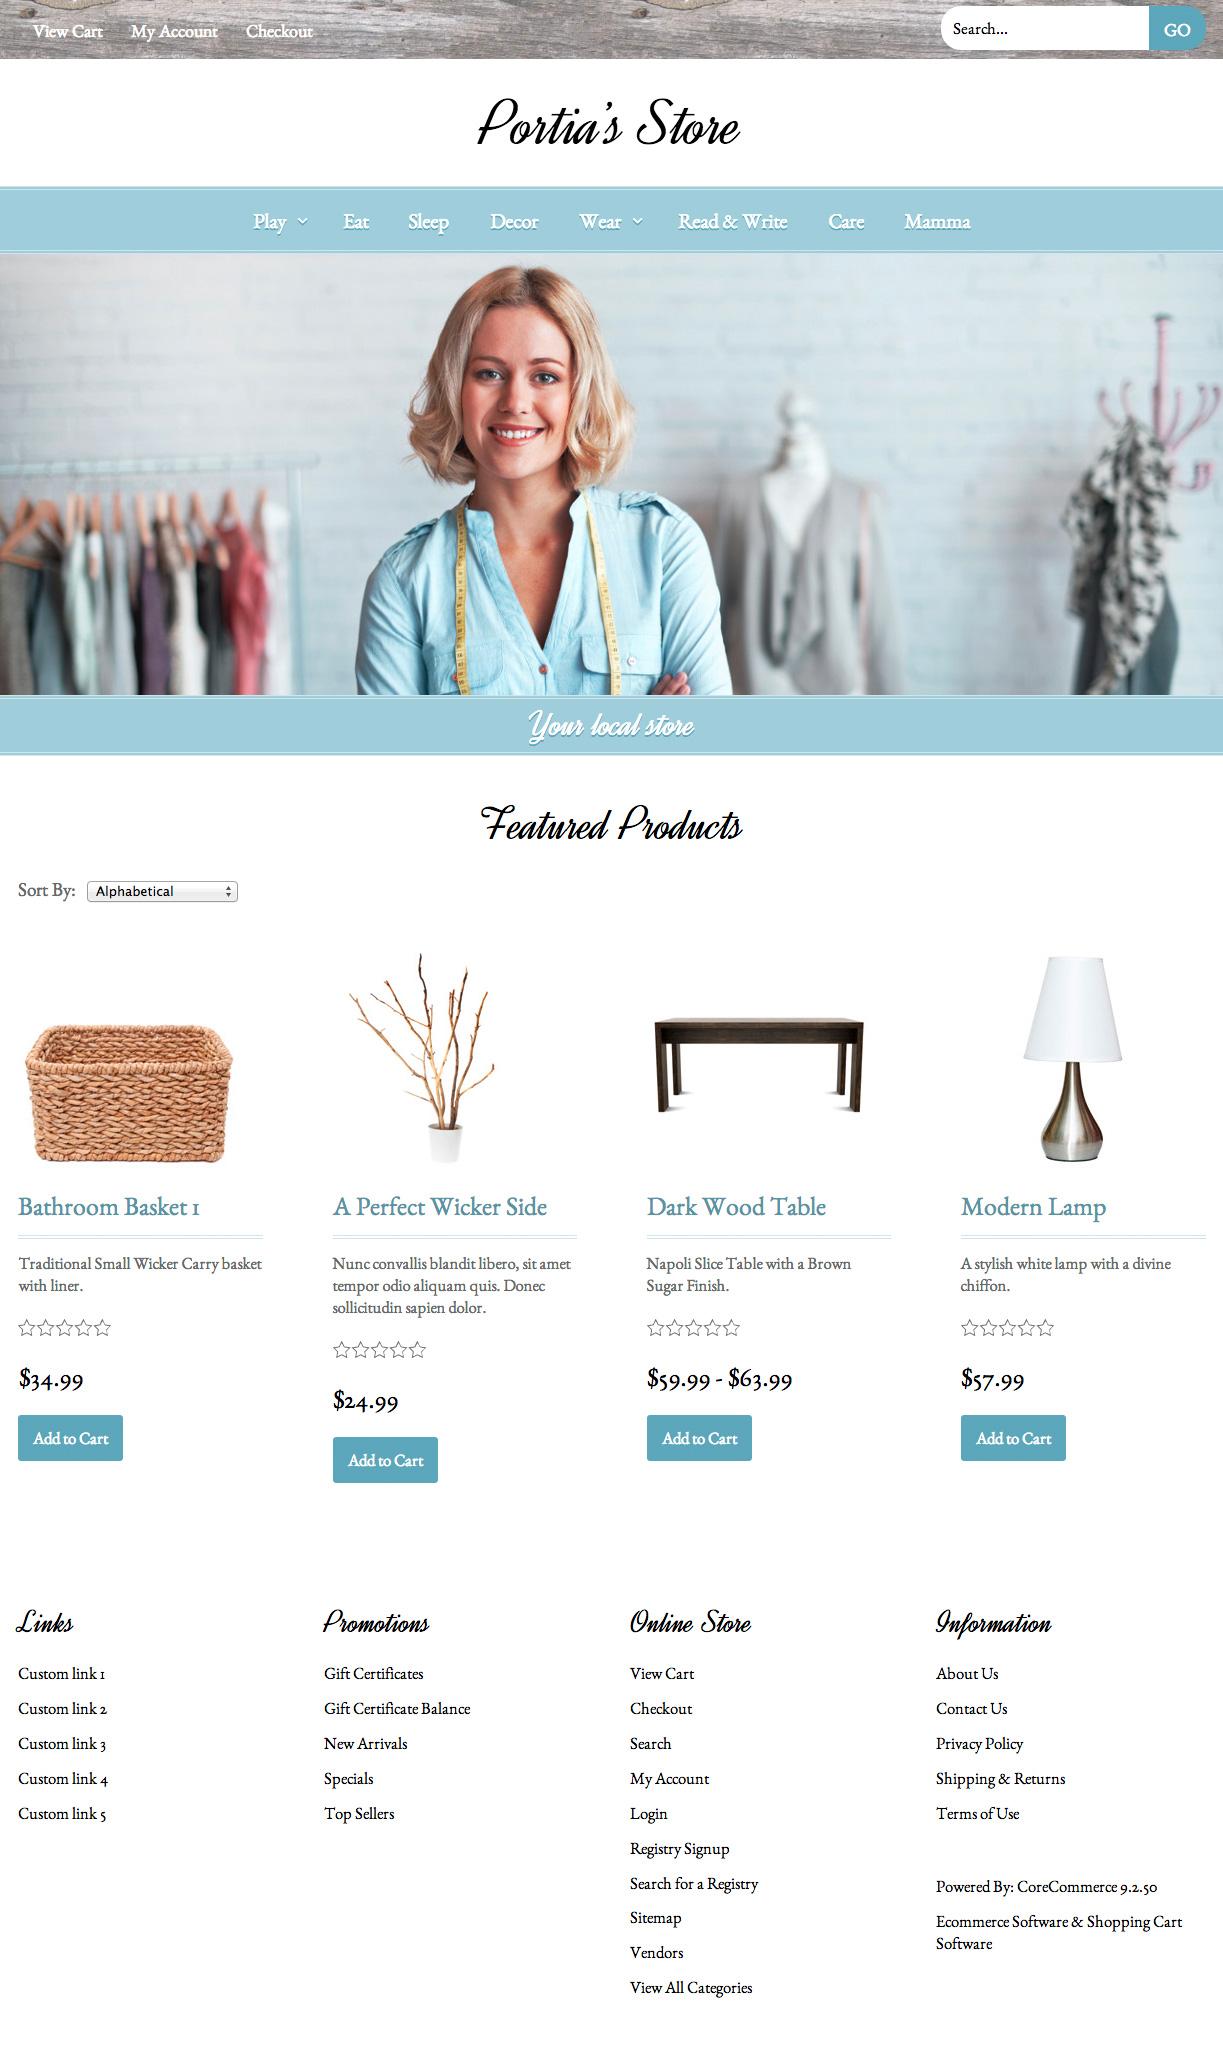 CoreCommerce Portia Theme